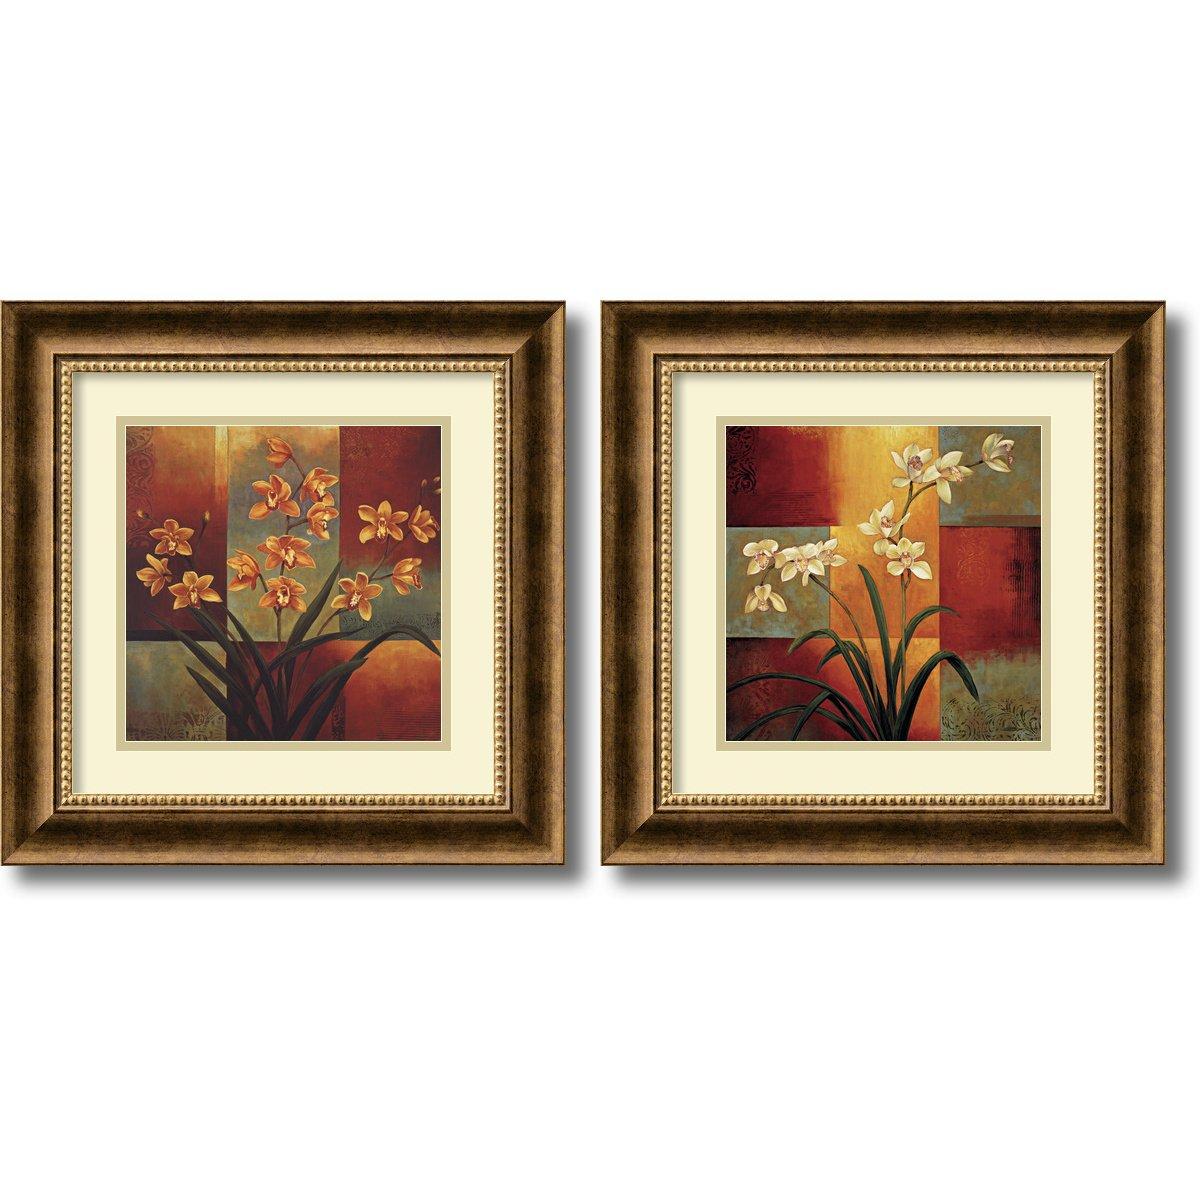 Framed Art Print, 'Orchids - set of 2' by Jill Deveraux: Outer Size 17 x 17'' Each